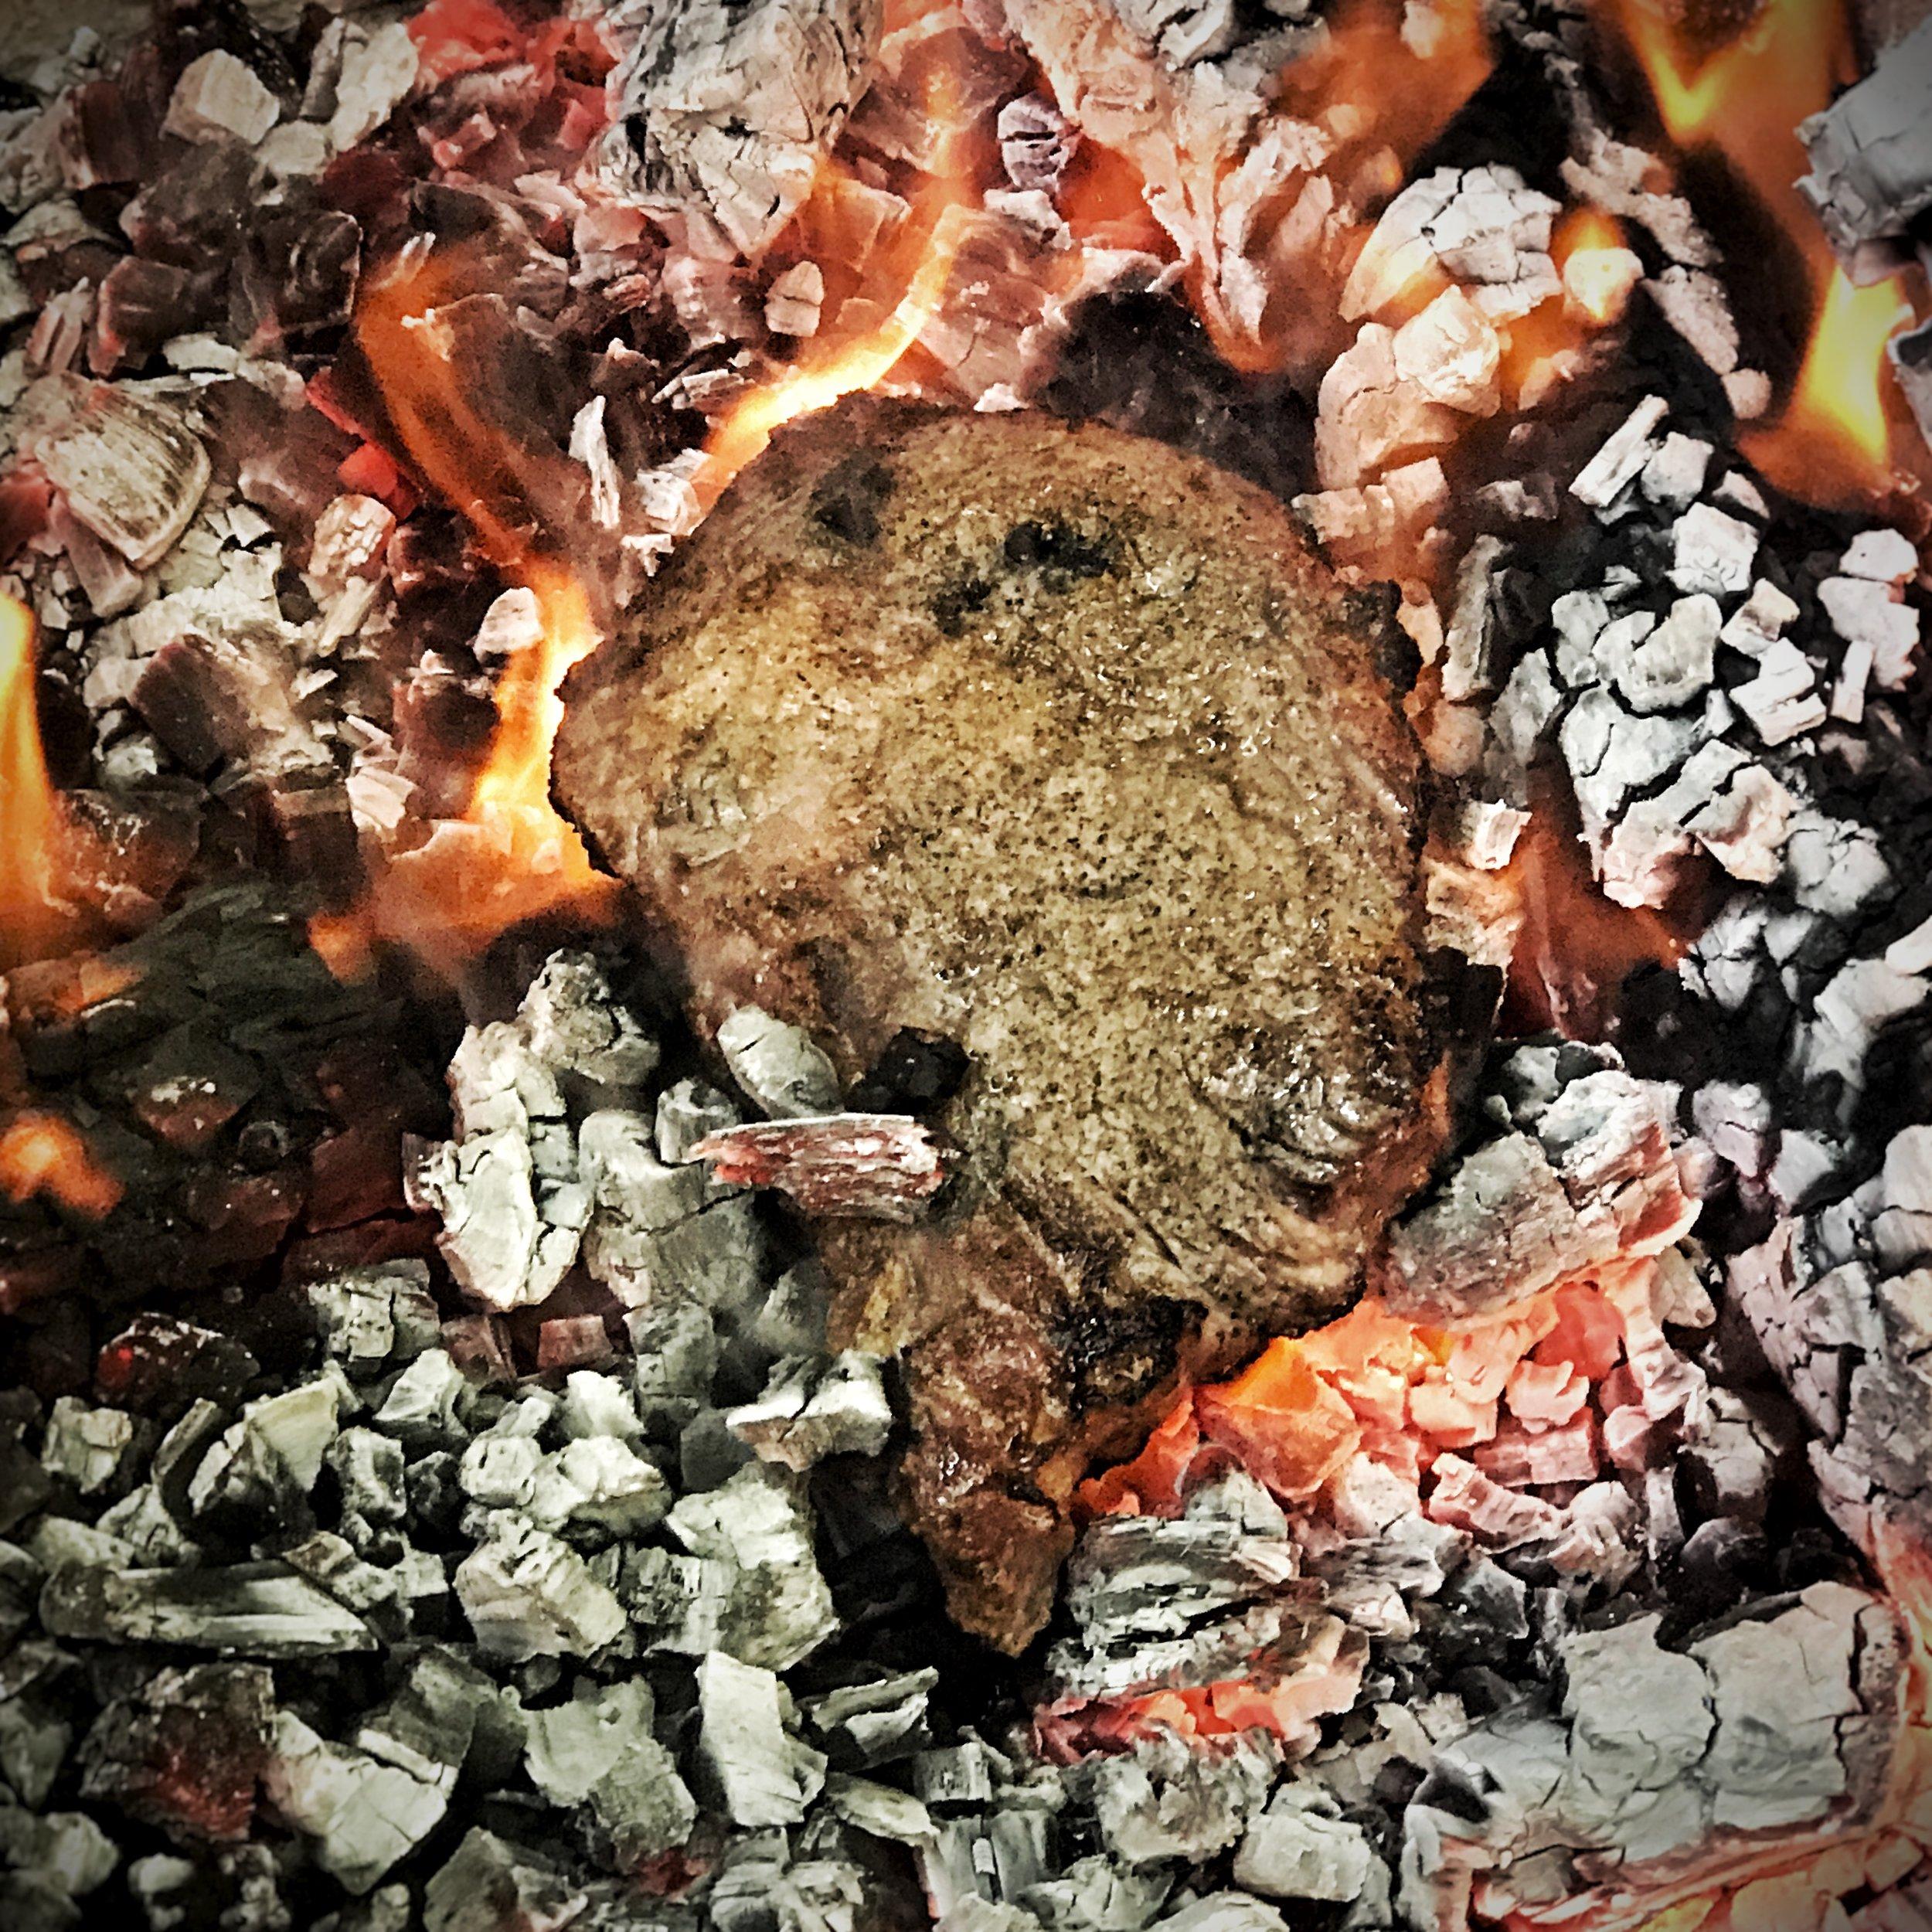 A dirty steak on the coals. (Salt and Pepper)